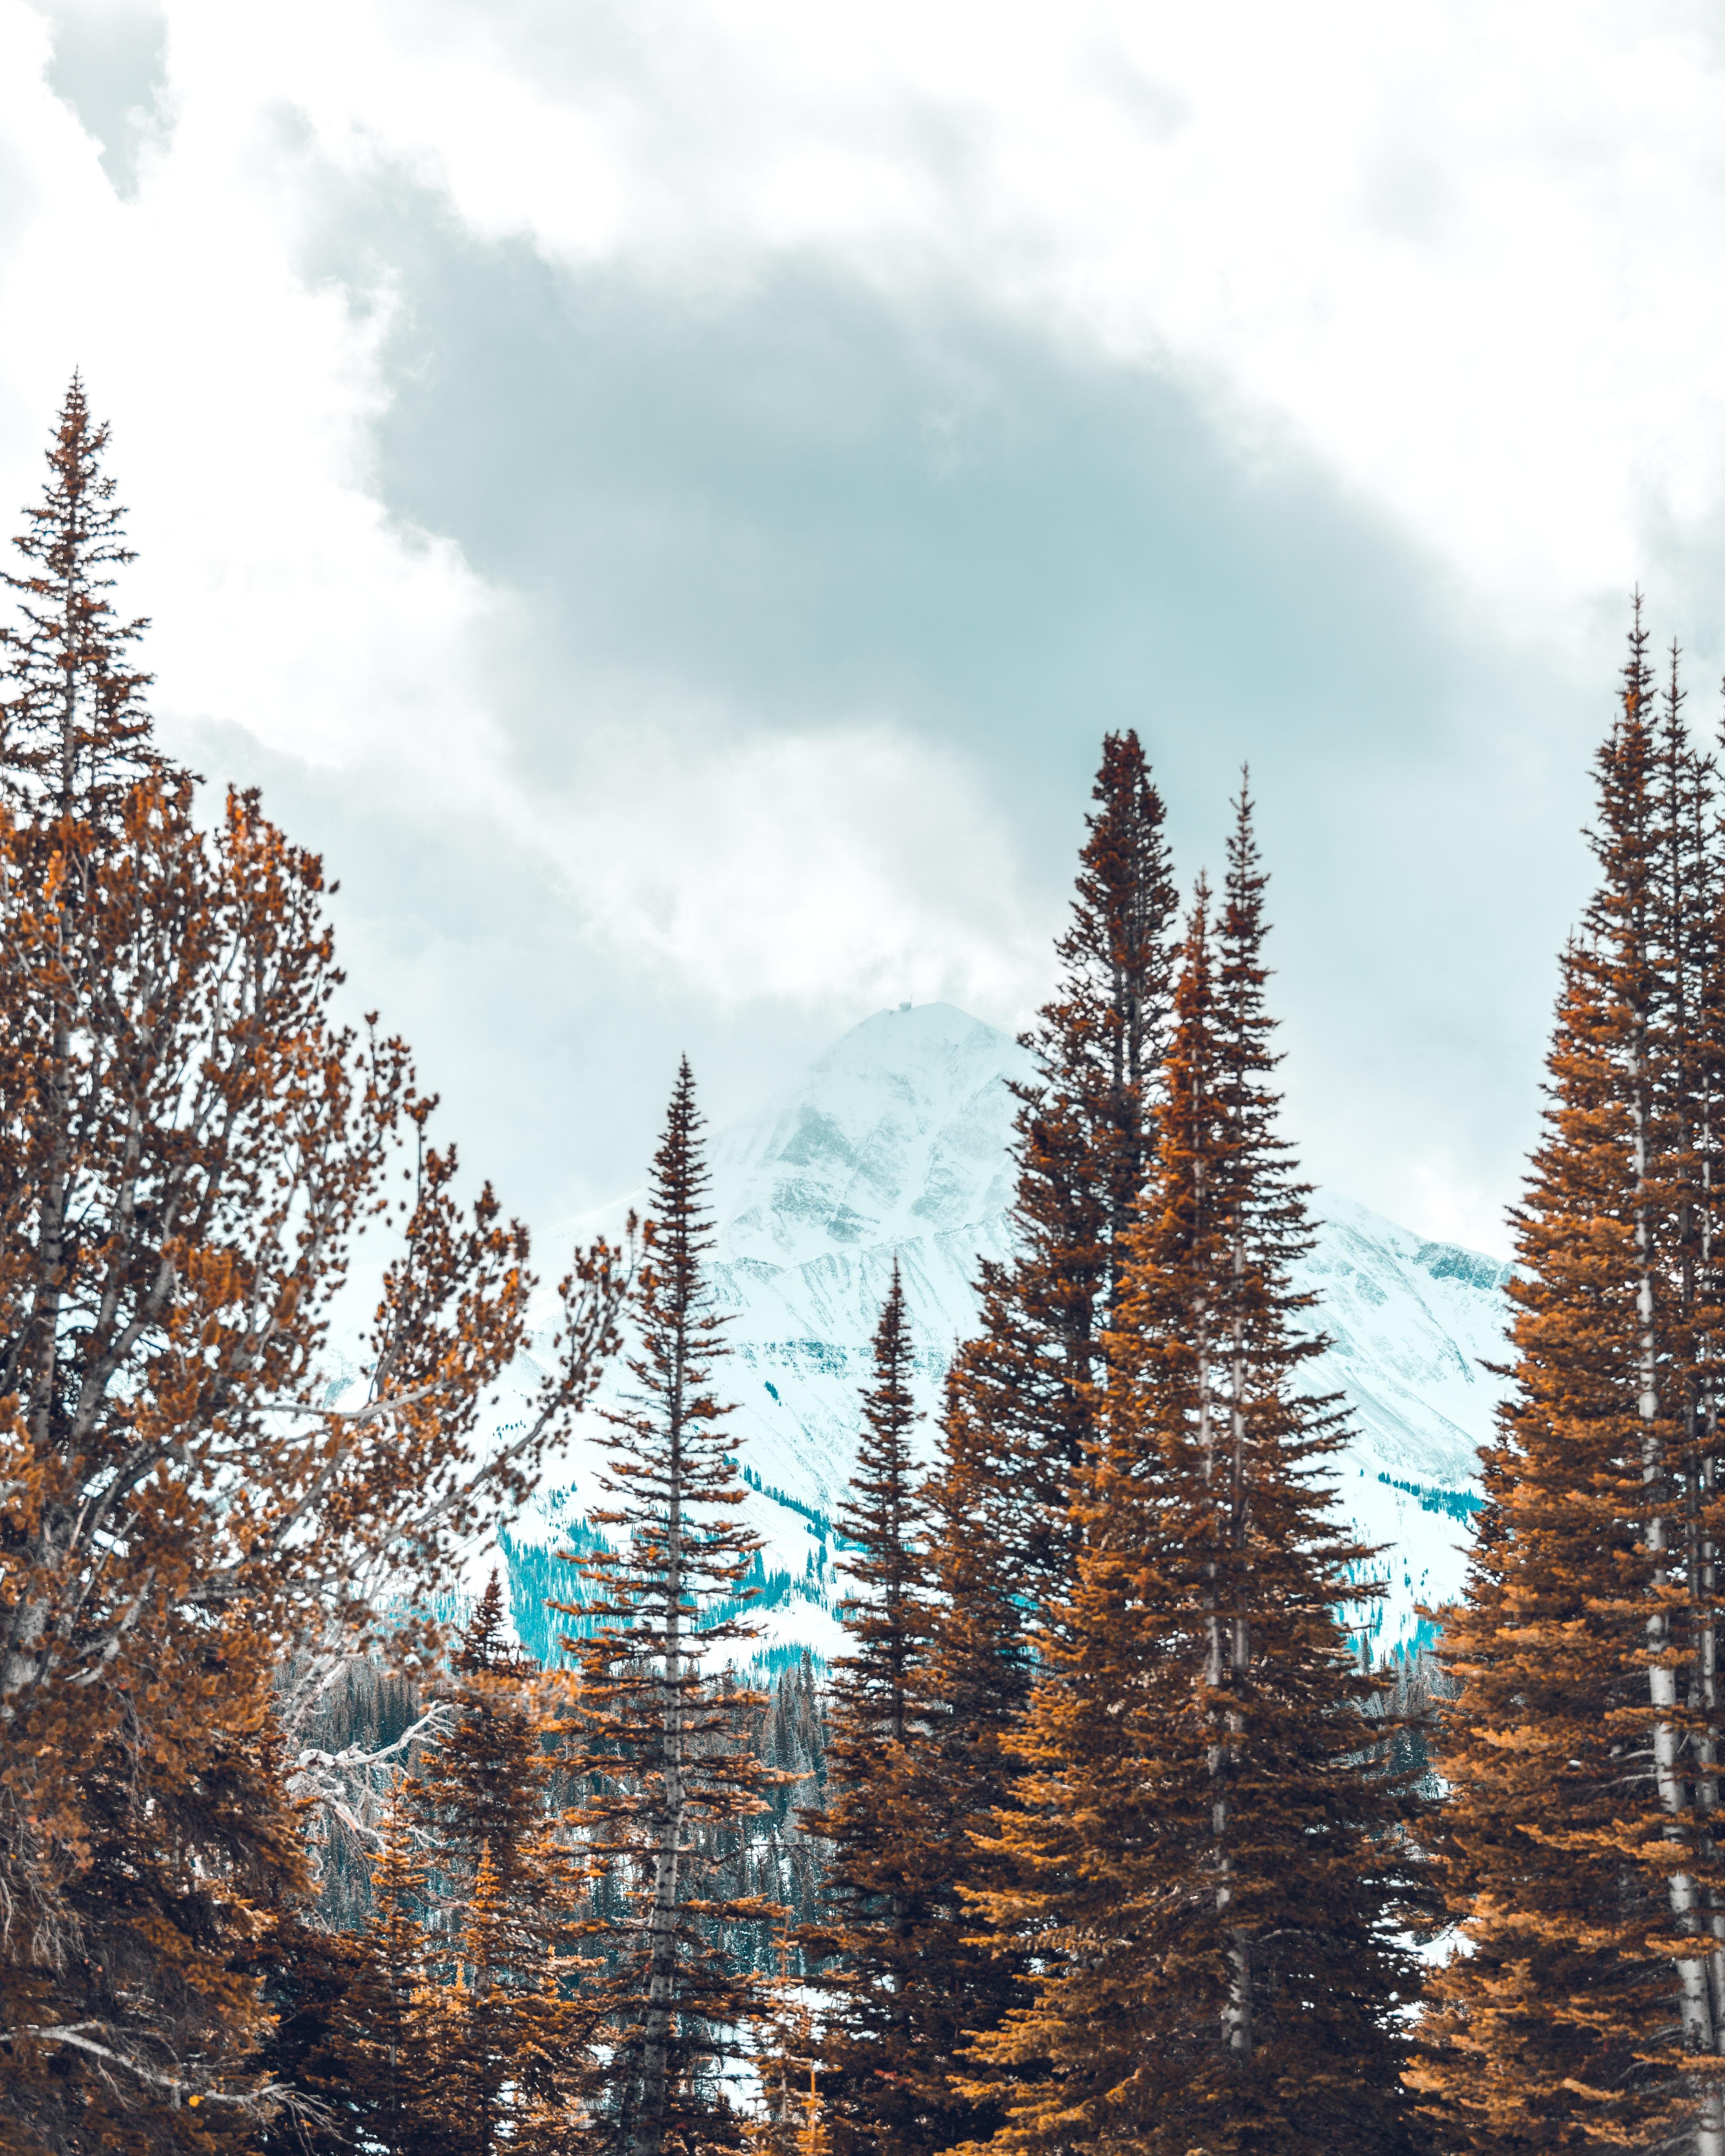 photo of pine tree near mountain under blue sky